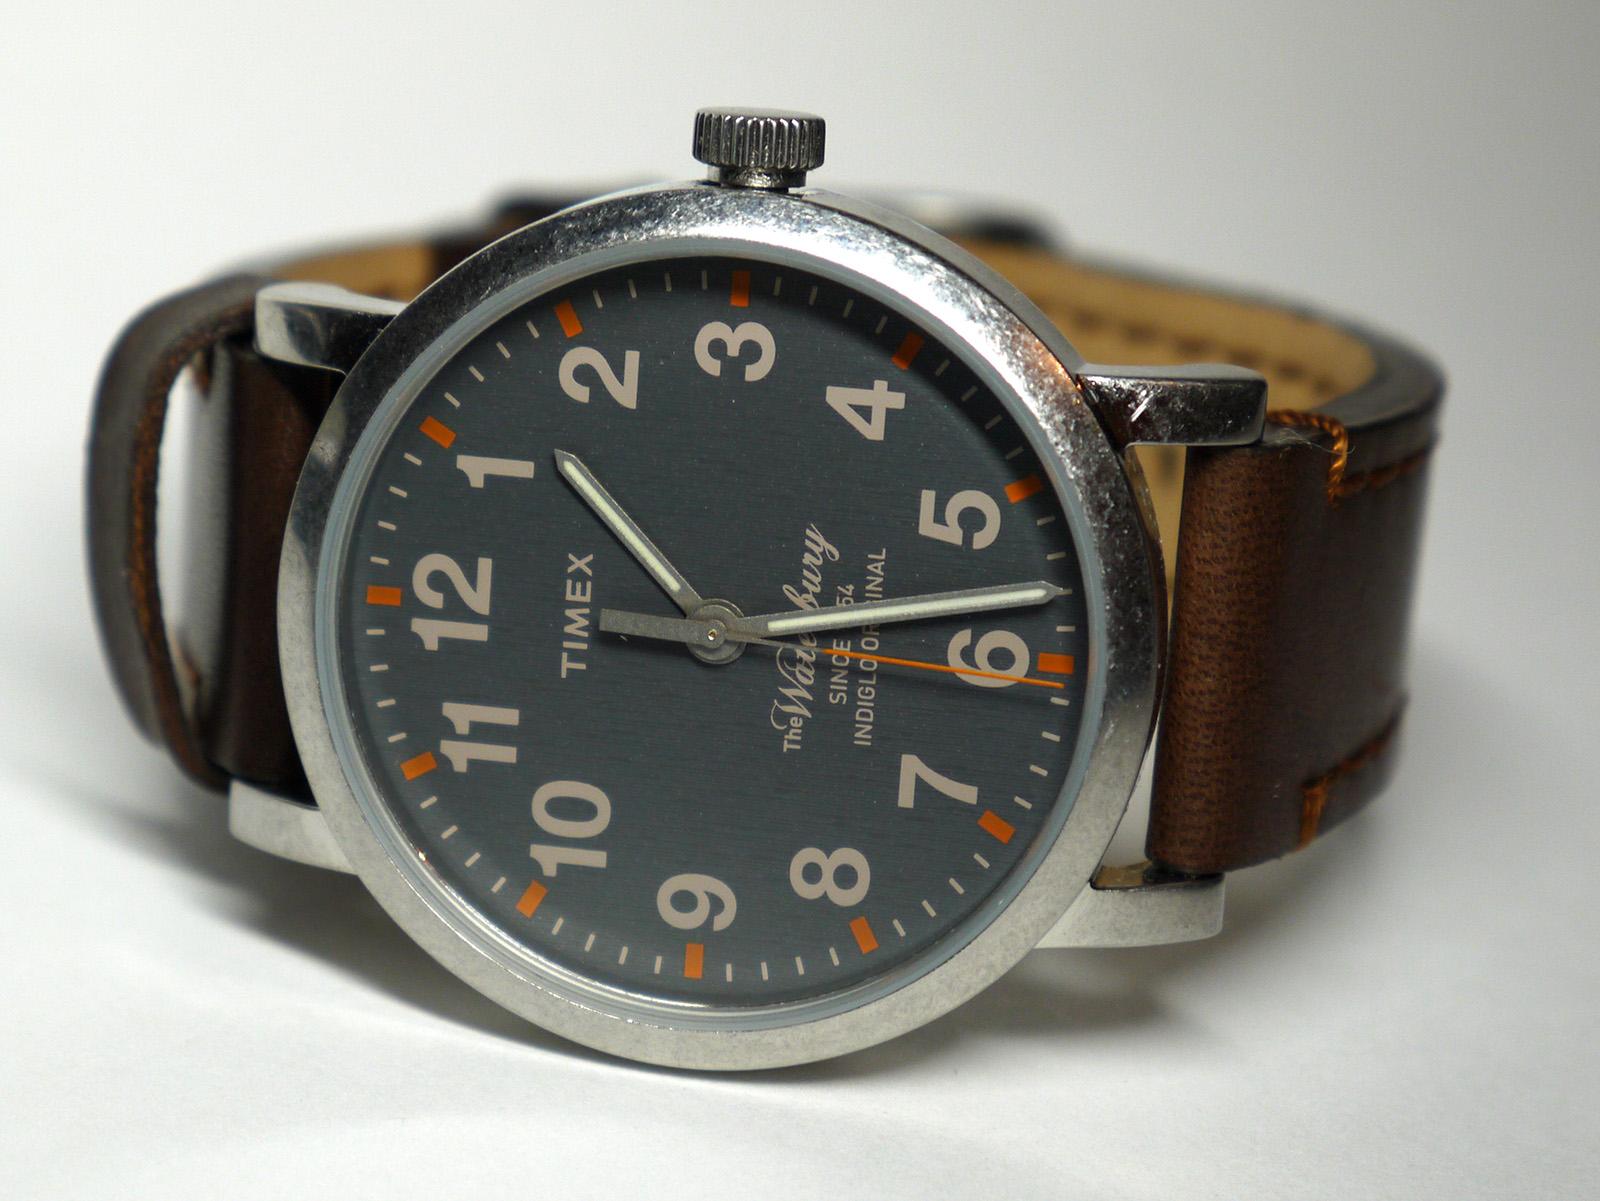 Timex Tw2p58700 Waterbury Watch ⋆ High Quality Watch Gallery